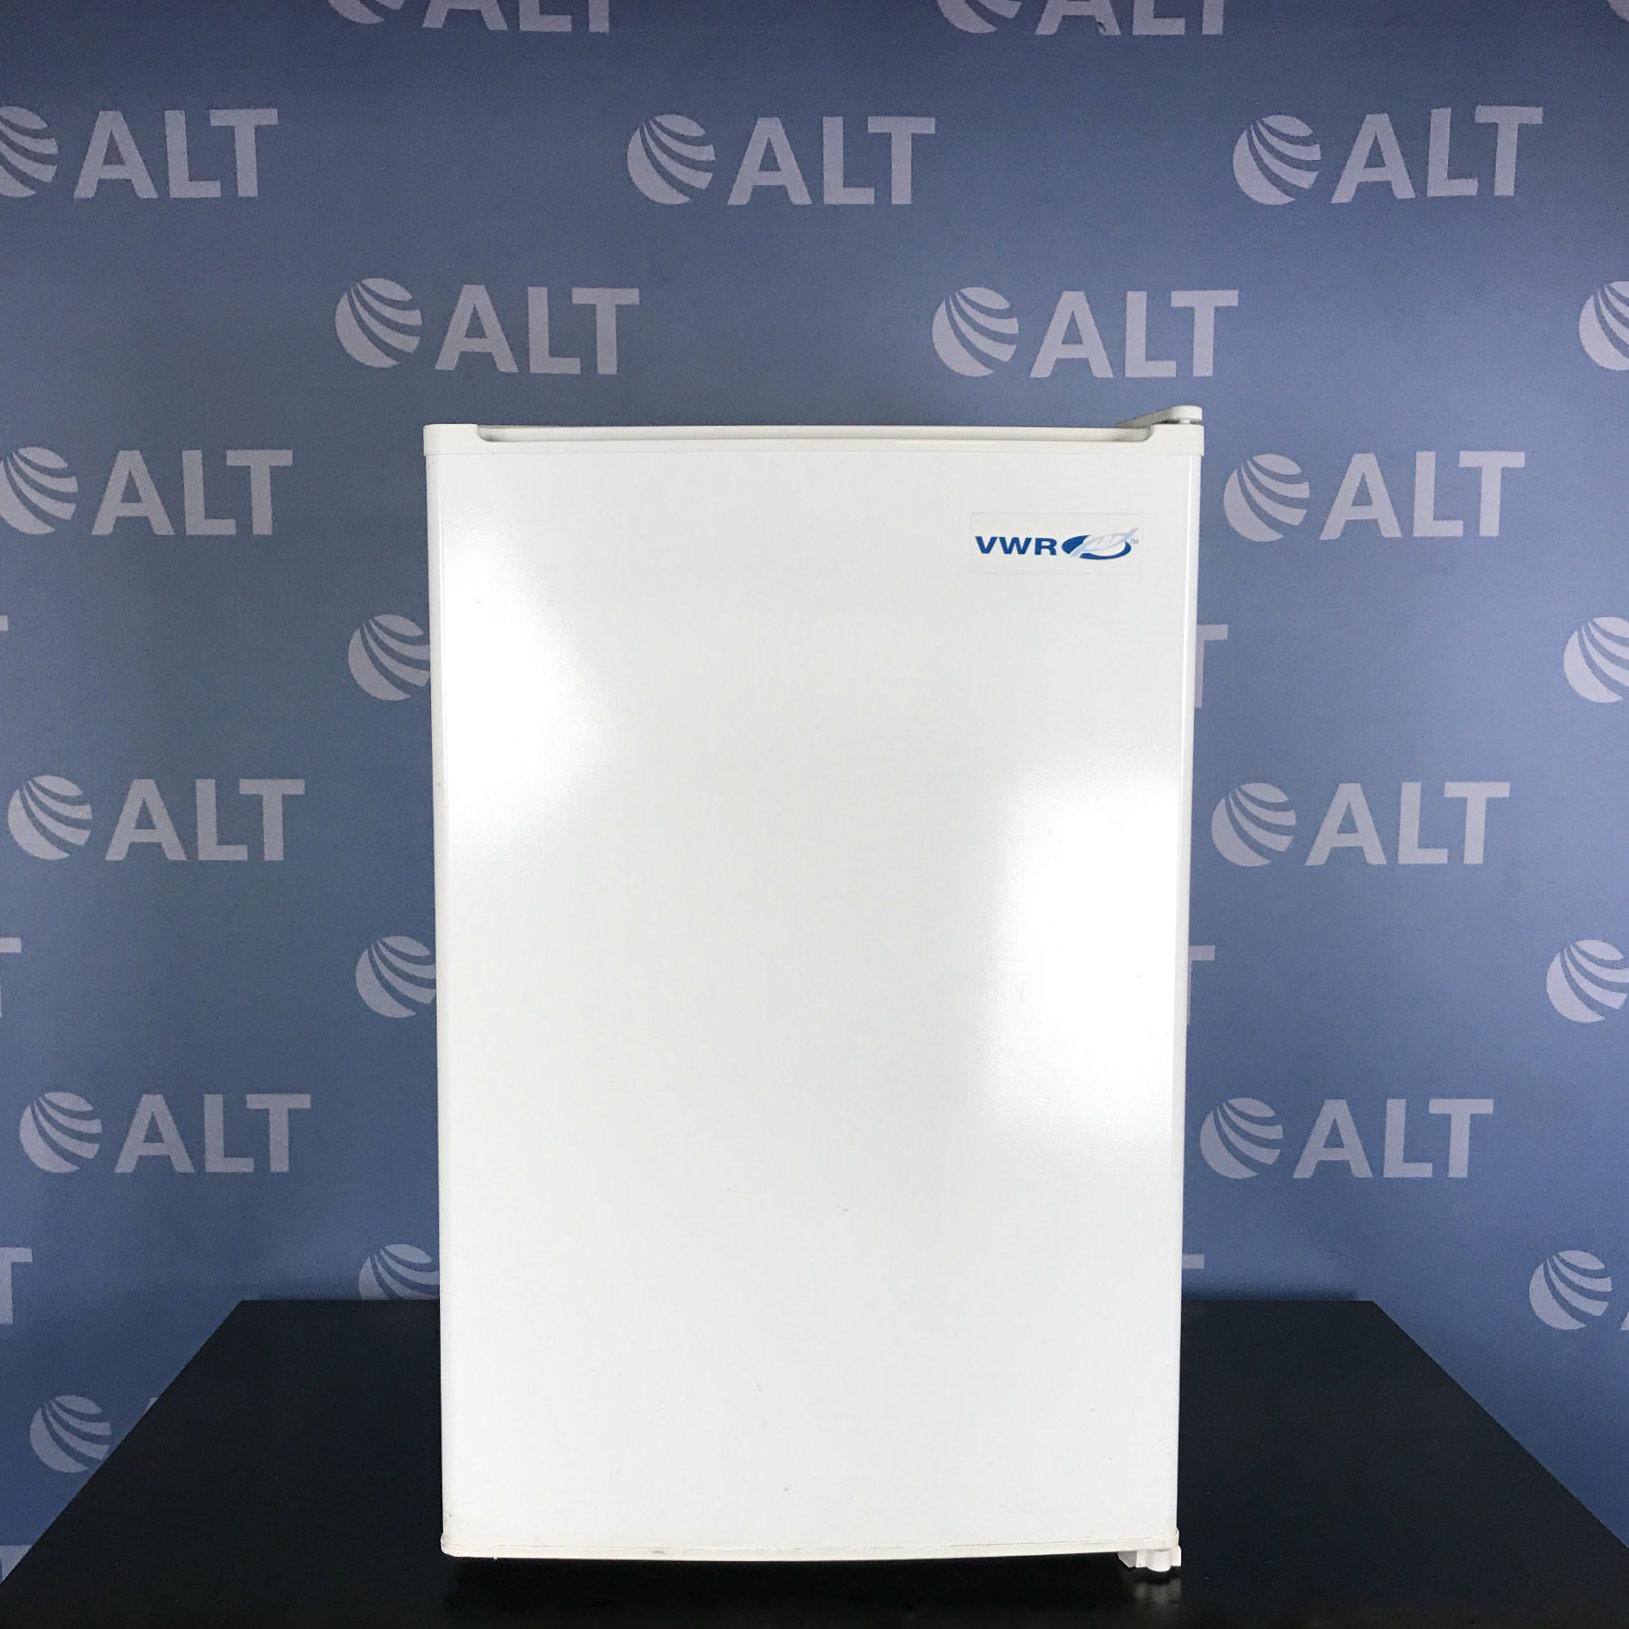 Sanyo HF-5015 Under the Counter Freezer Image